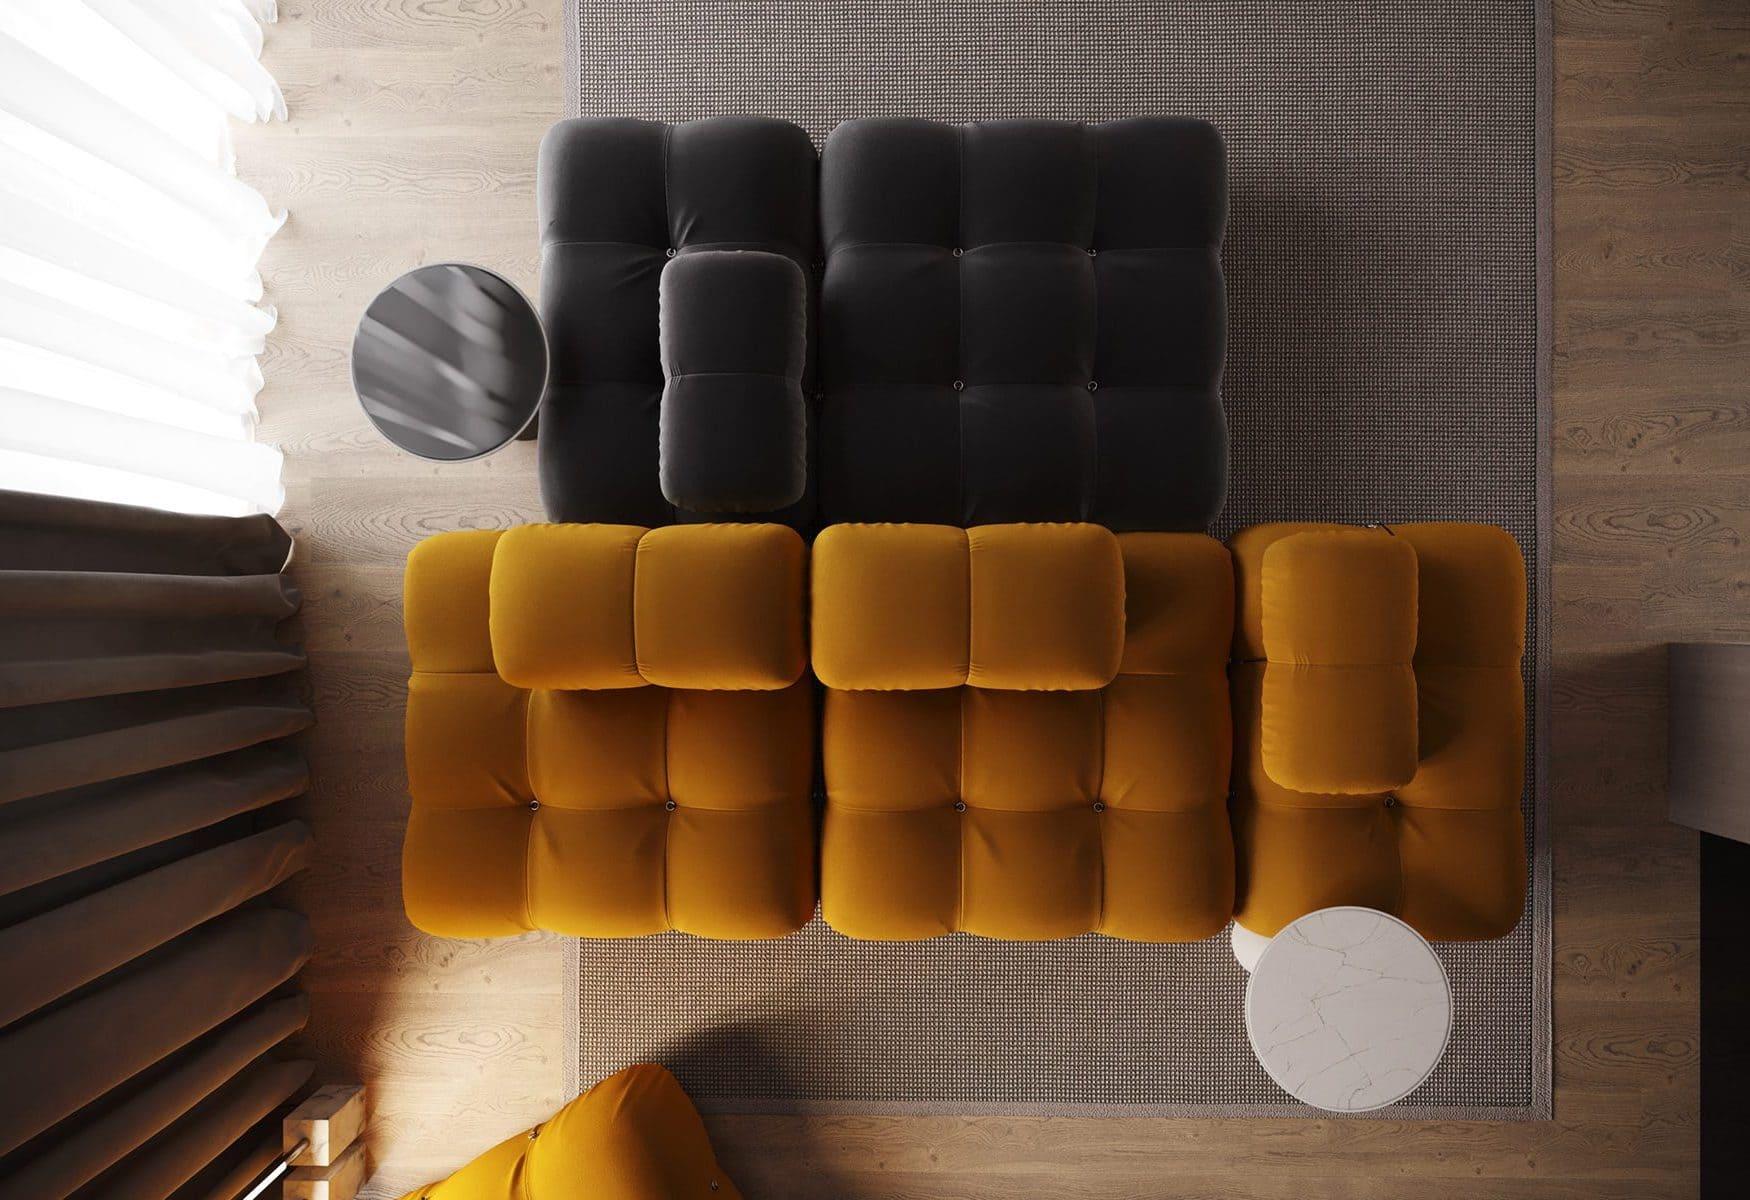 дизайн интерьера модной квартиры фото 3